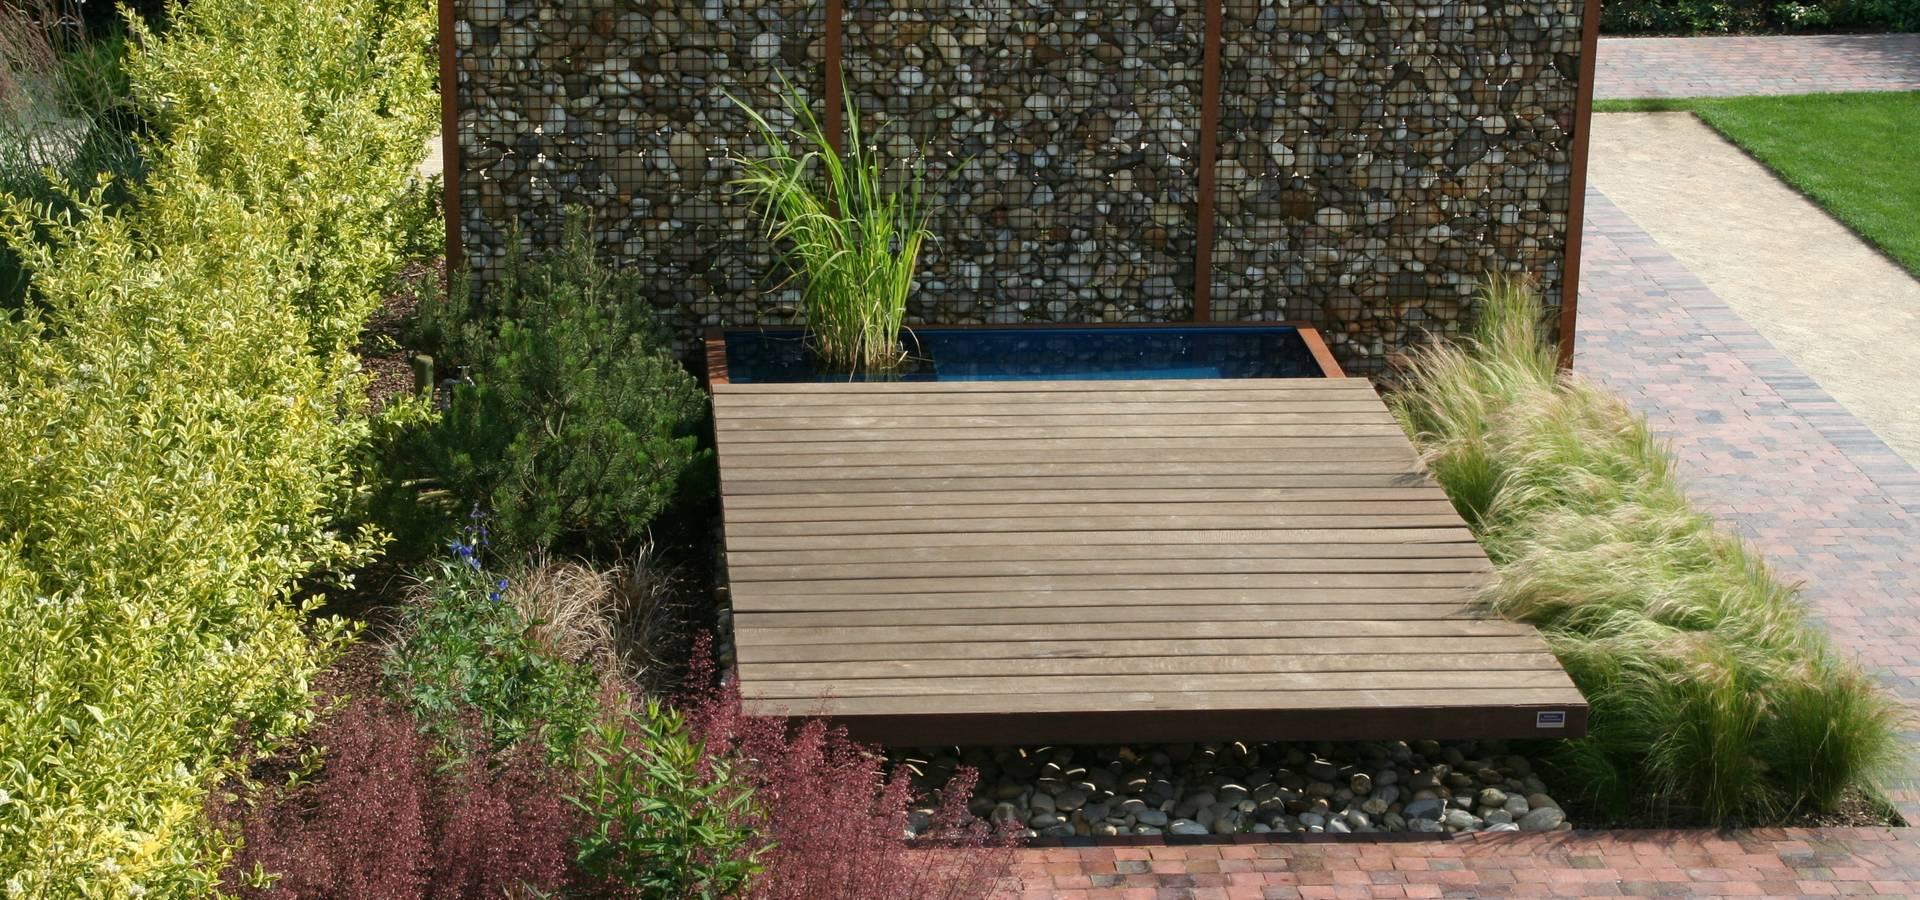 beate schr der landschaftsarchitektin moderner garten. Black Bedroom Furniture Sets. Home Design Ideas